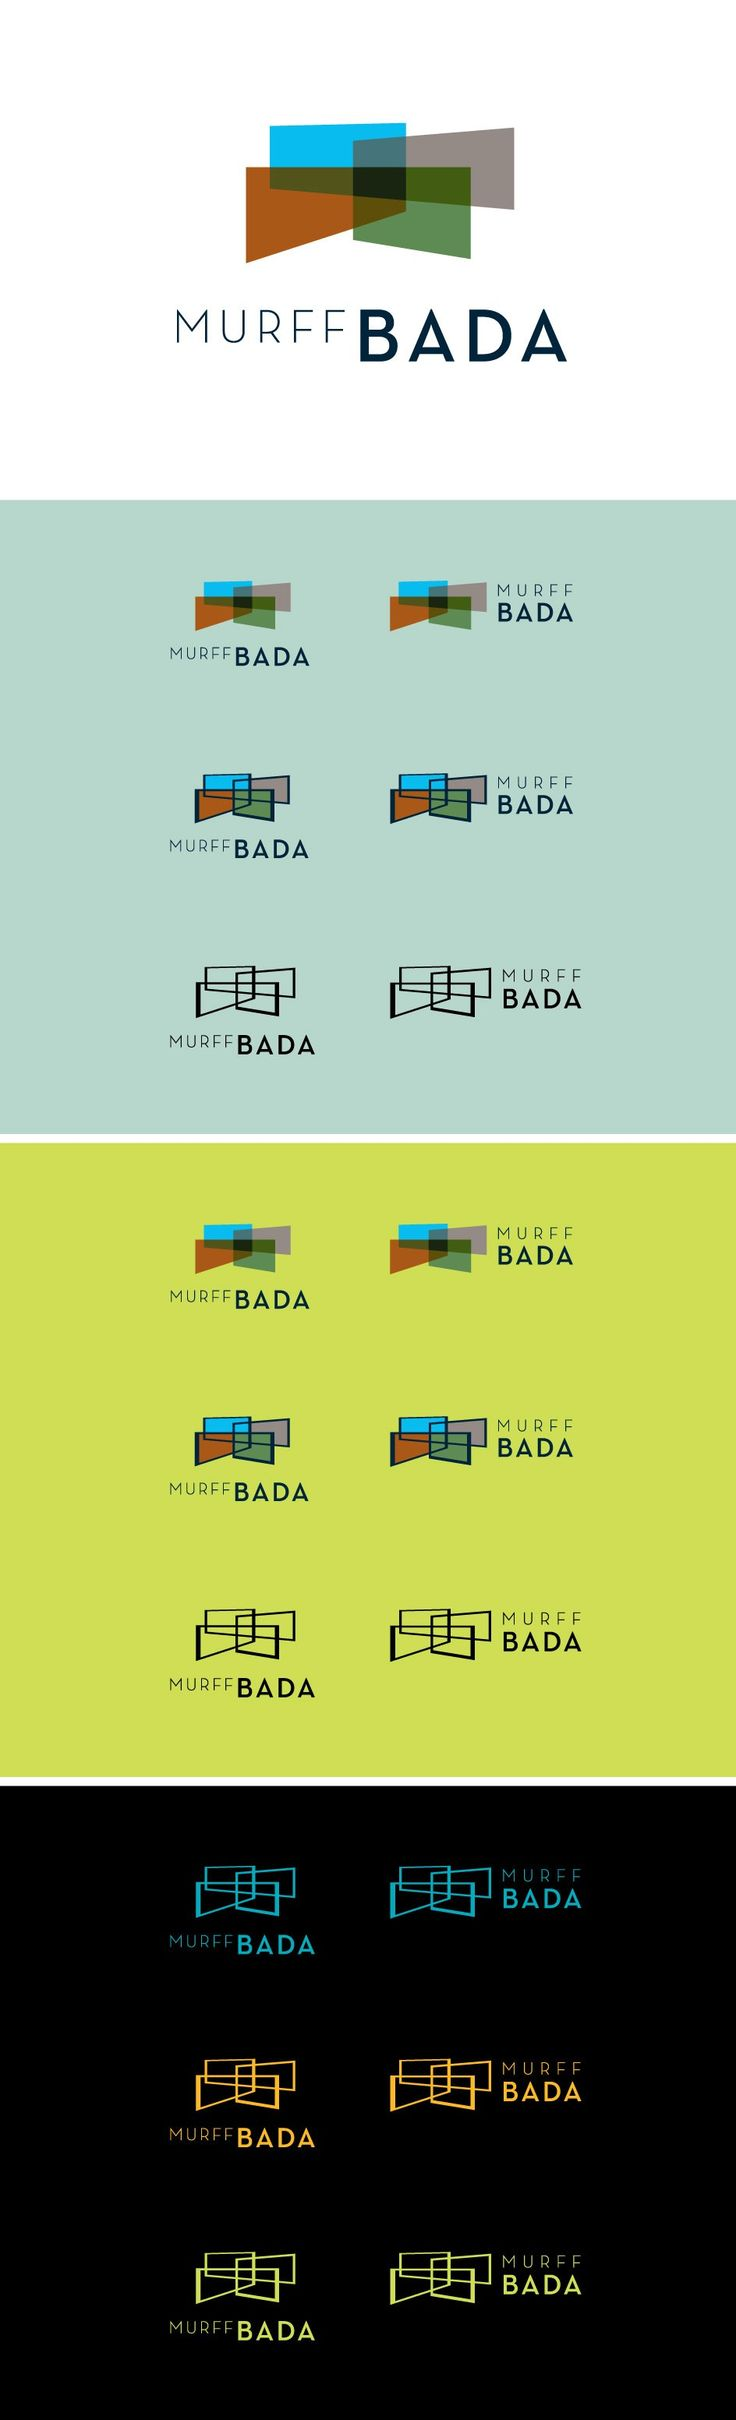 MURFF BADA Logo Family Architect